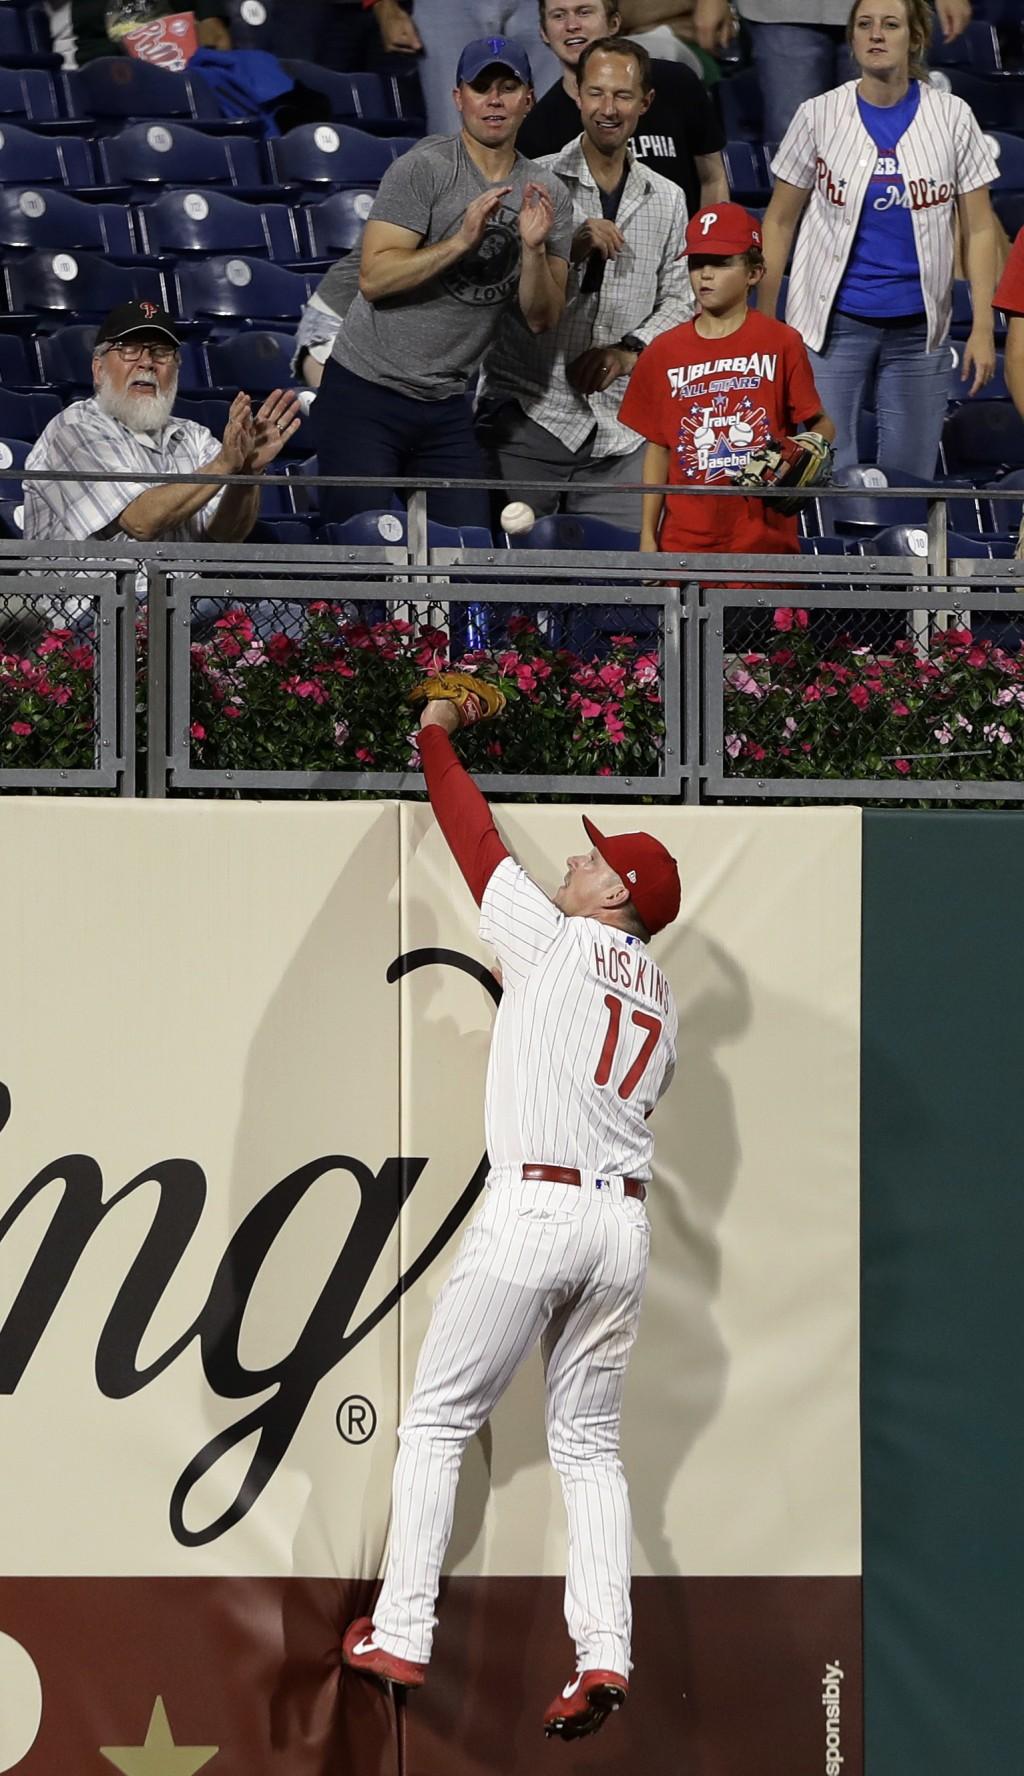 Philadelphia Phillies left fielder Rhys Hoskins cannot reach a home run by New York Mets' Steven Matz during the third inning of a baseball game Tuesd...